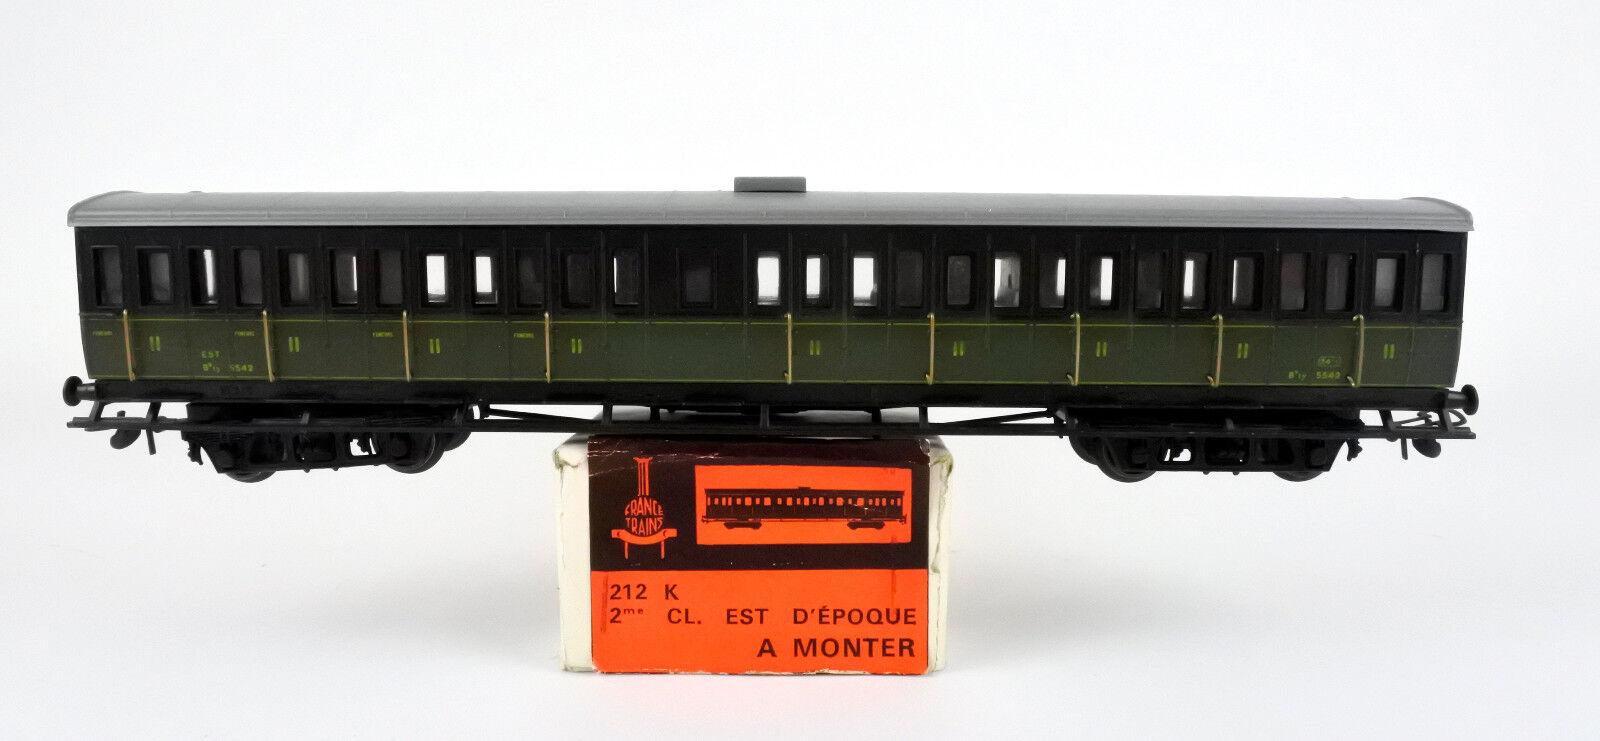 FRANCE TRAINS HO SCALE 212 K FRANCH RAILWAY EST 2ND PASSENGER CAR